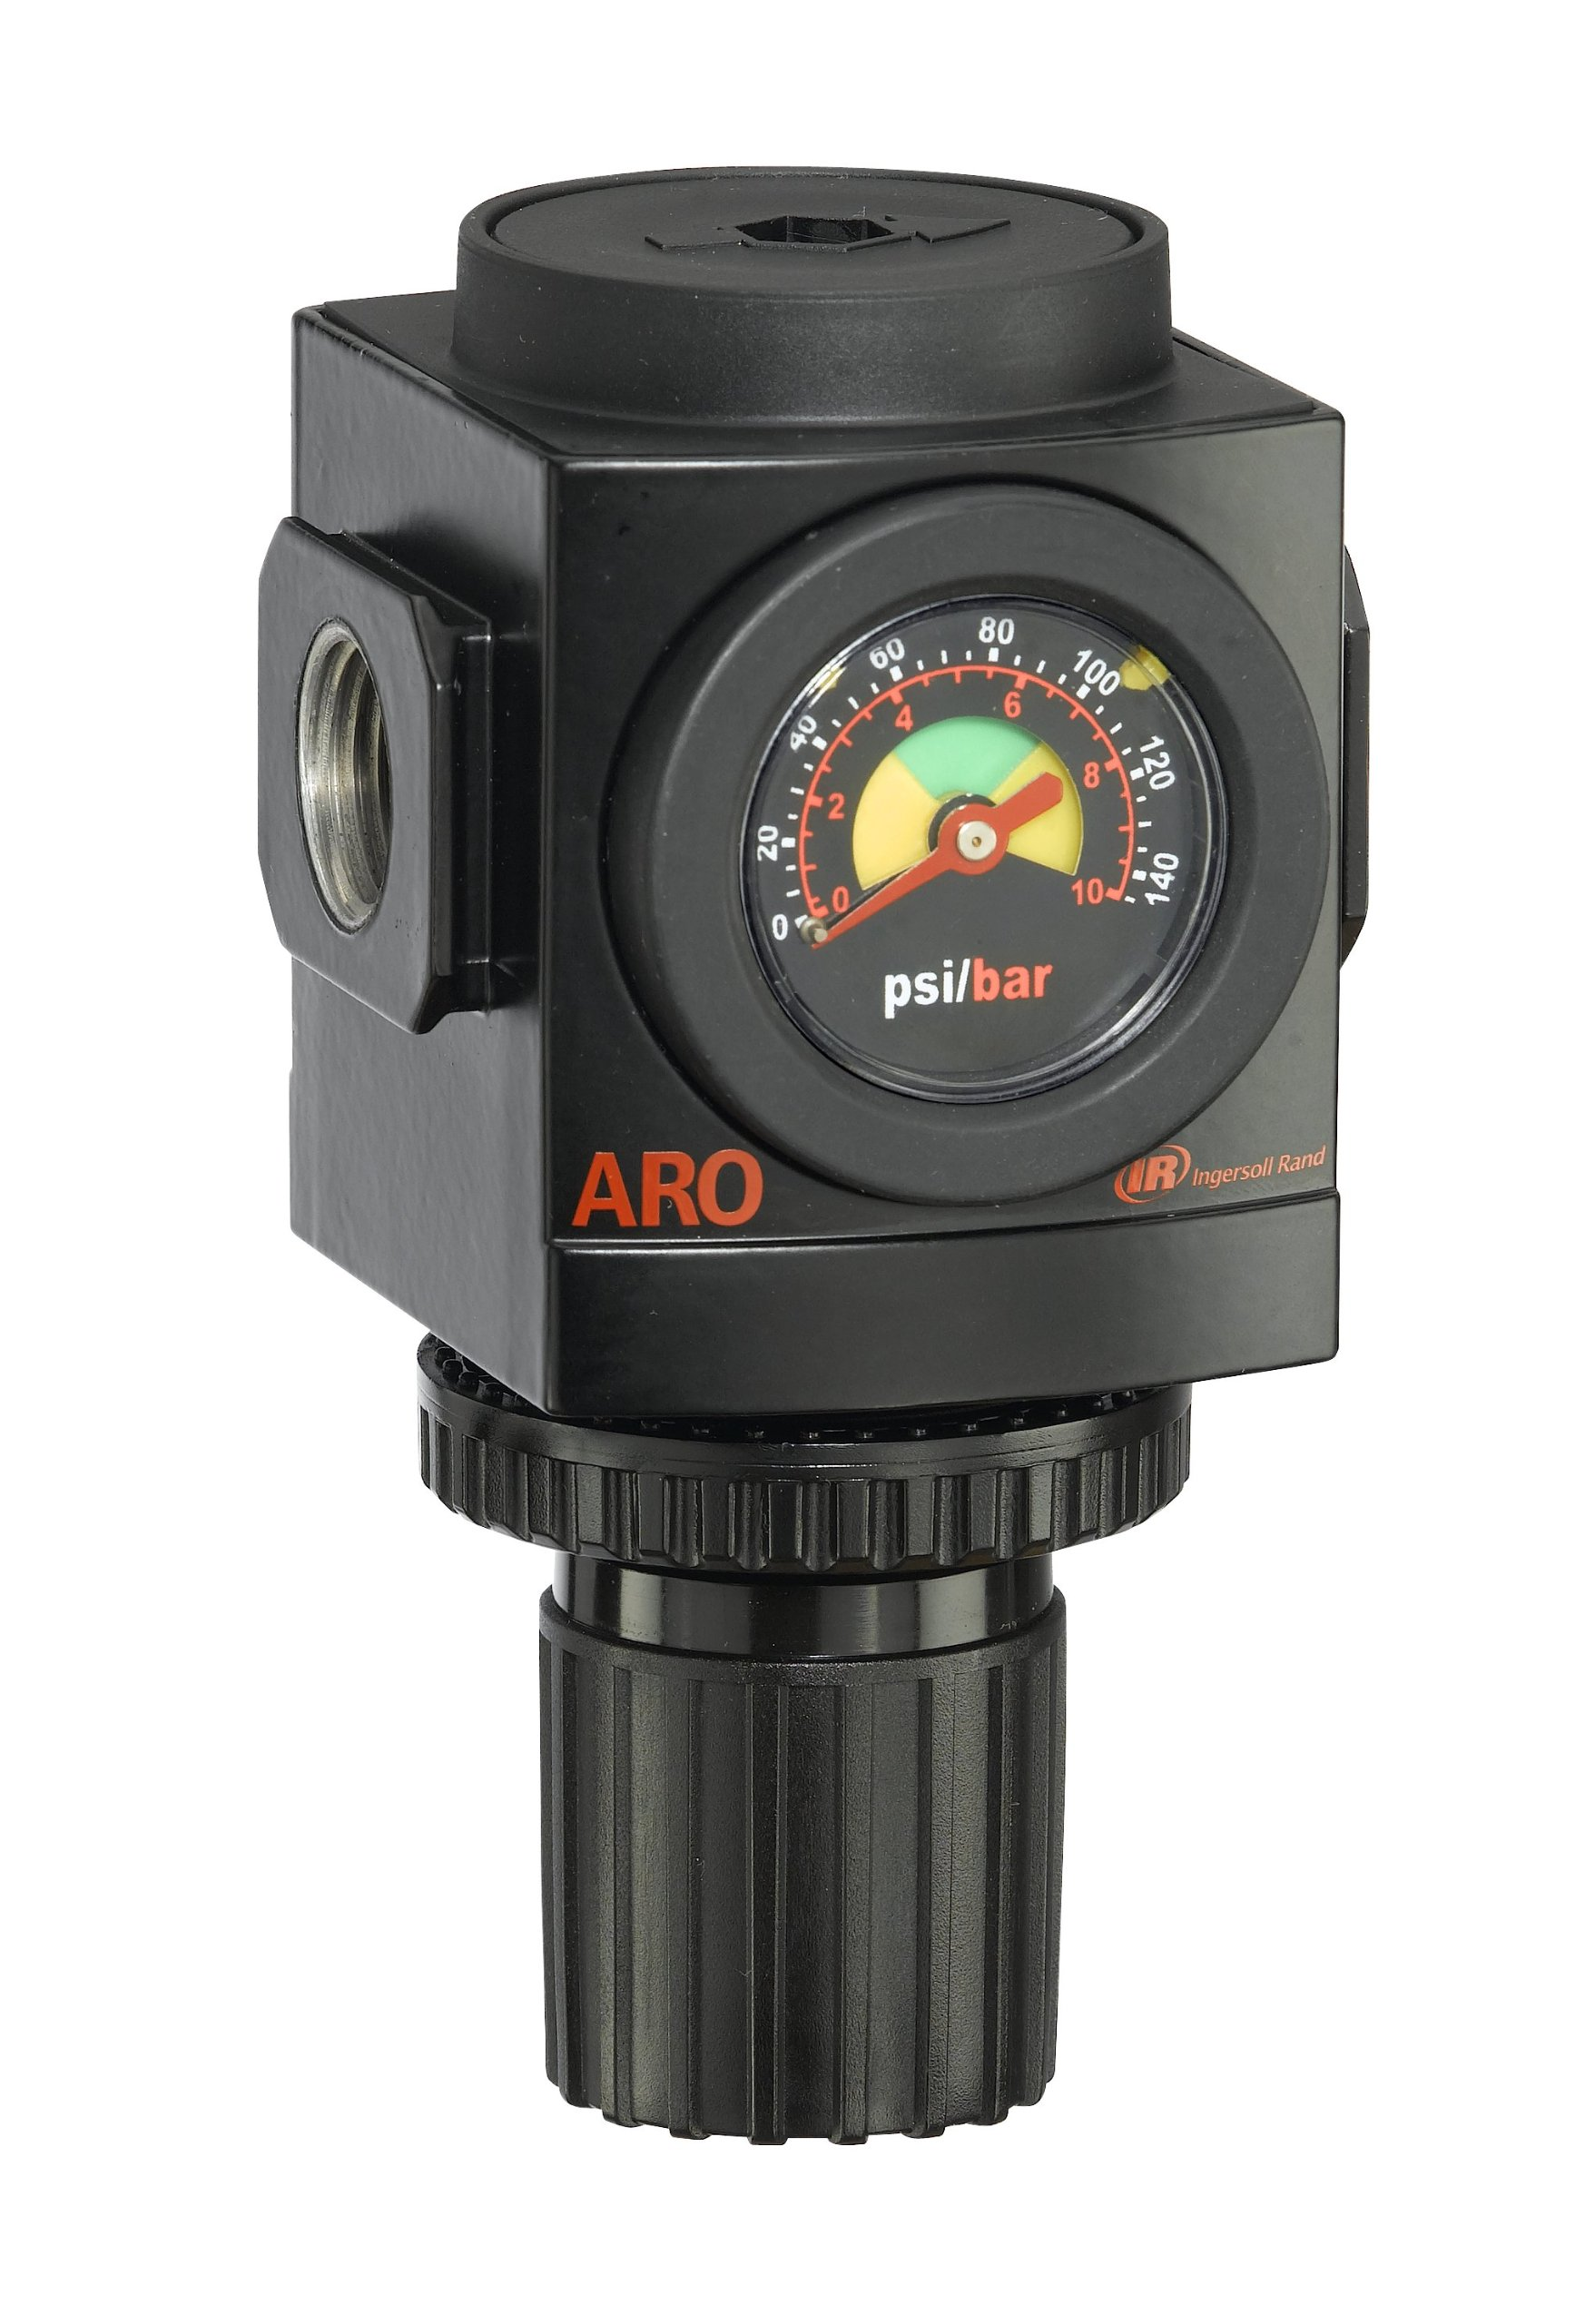 ARO R37341-600-VS Air Regulator 1/2'' NPT, w/ Gauge - 250 psi Max Inlet